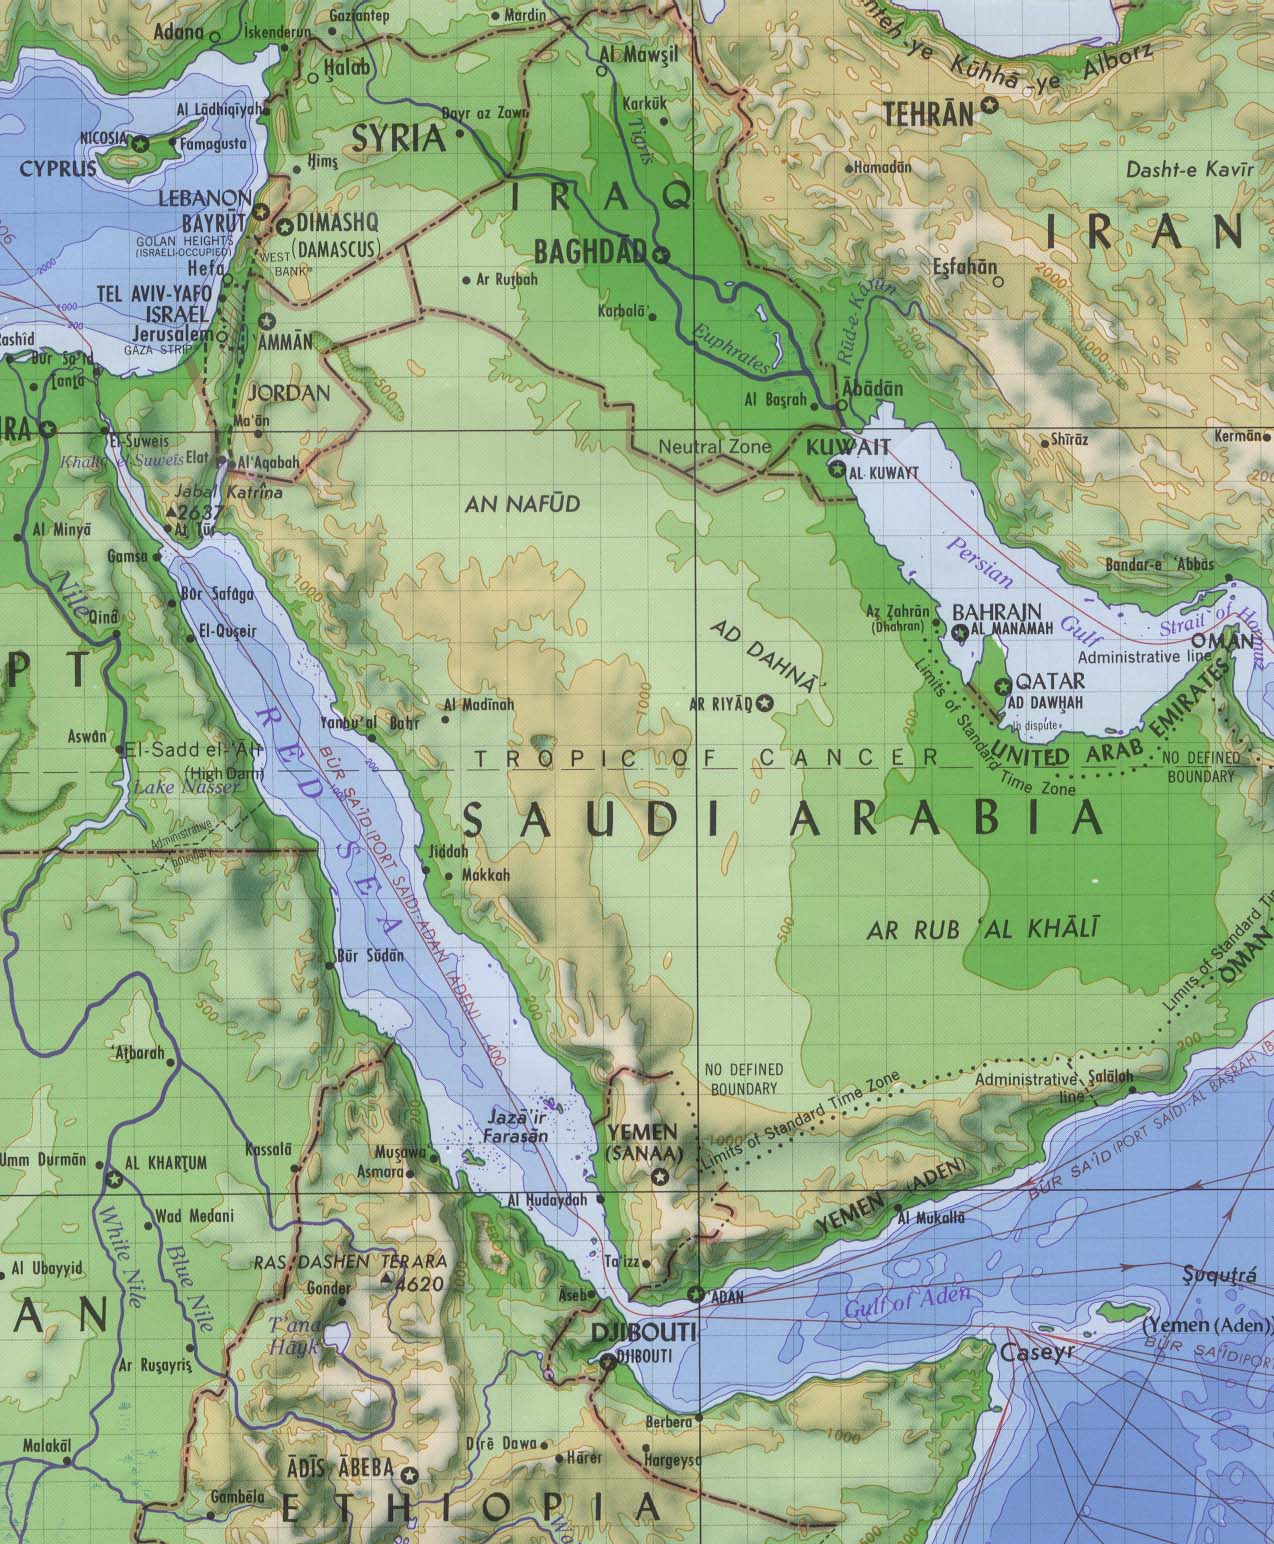 Arabia and Red Sea Elevation Map saudia arabia mappery